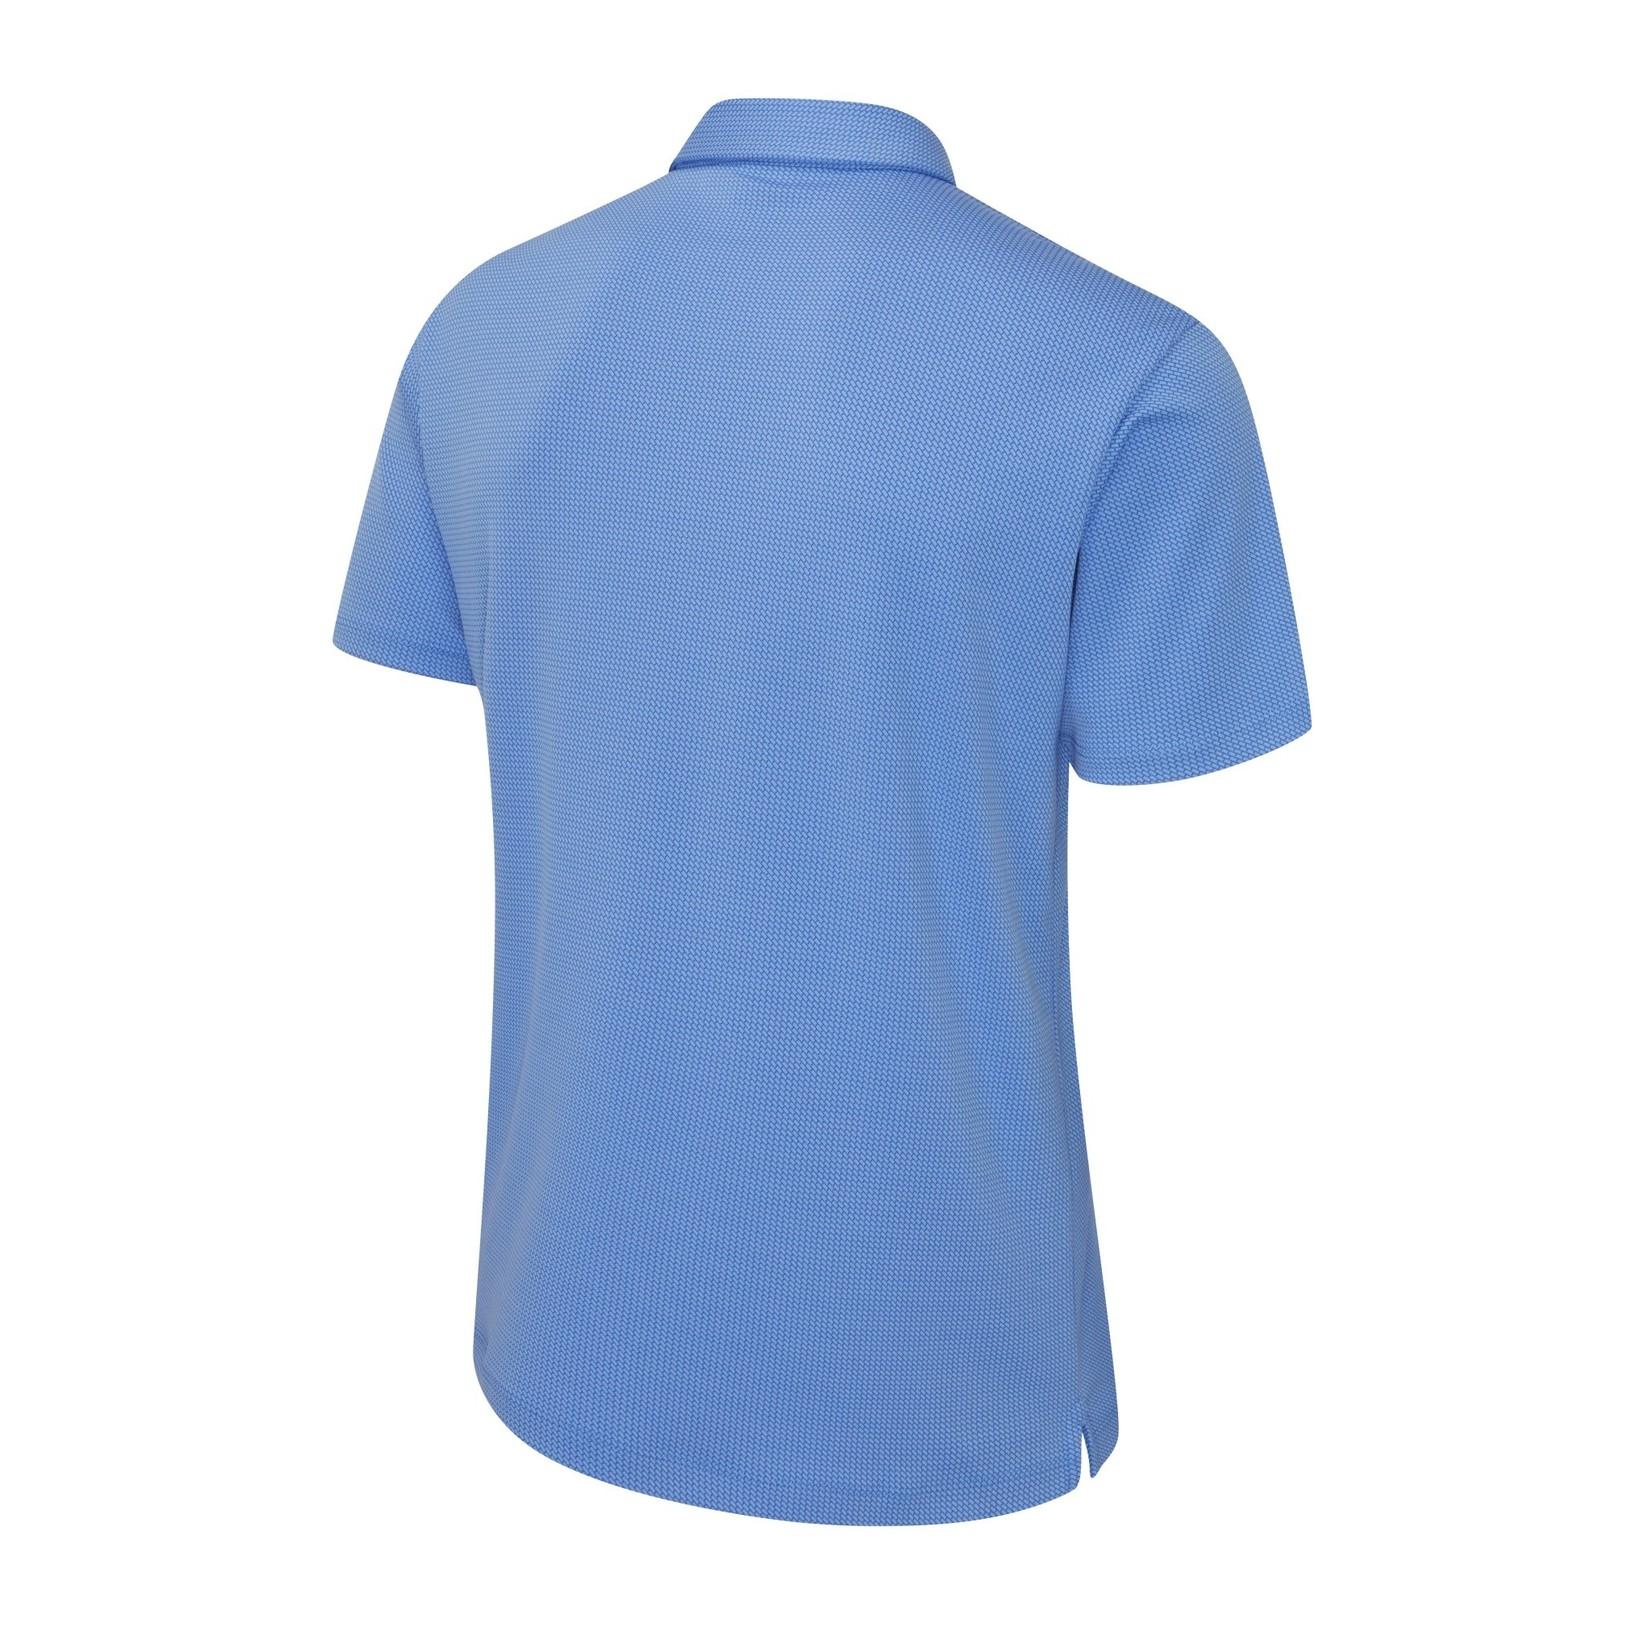 Ping Ping Preston Polo - Delph Blue Multi